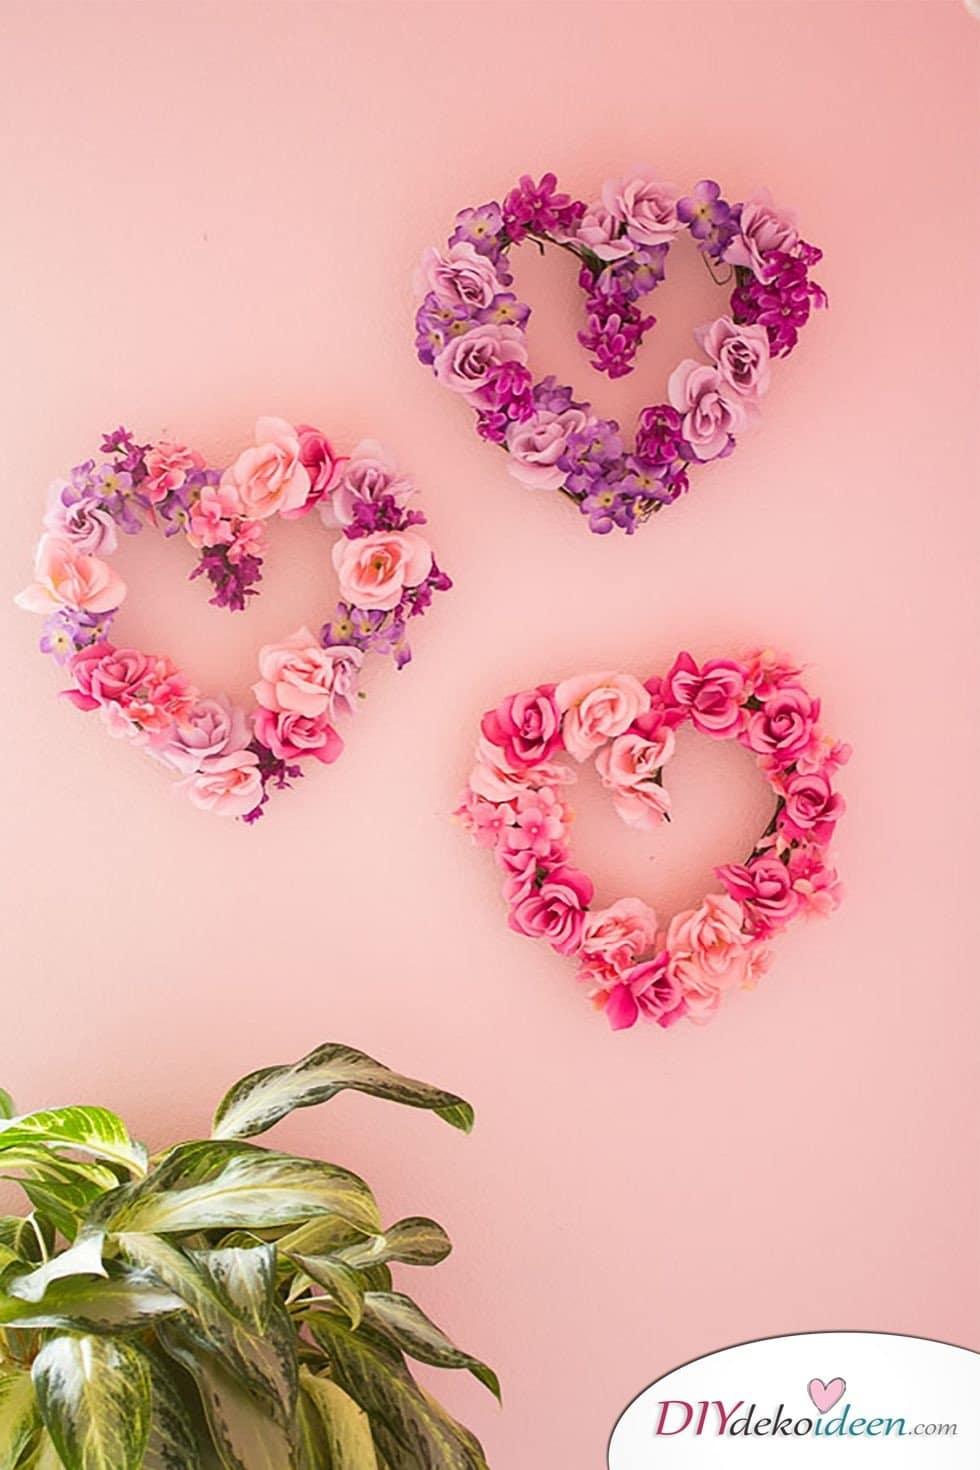 Blumenherzen, Valentinstag Deko Ideen, Deko Valentinstag, dekorieren, DIY Dekoideen, Deko basteln, romantische Deko,